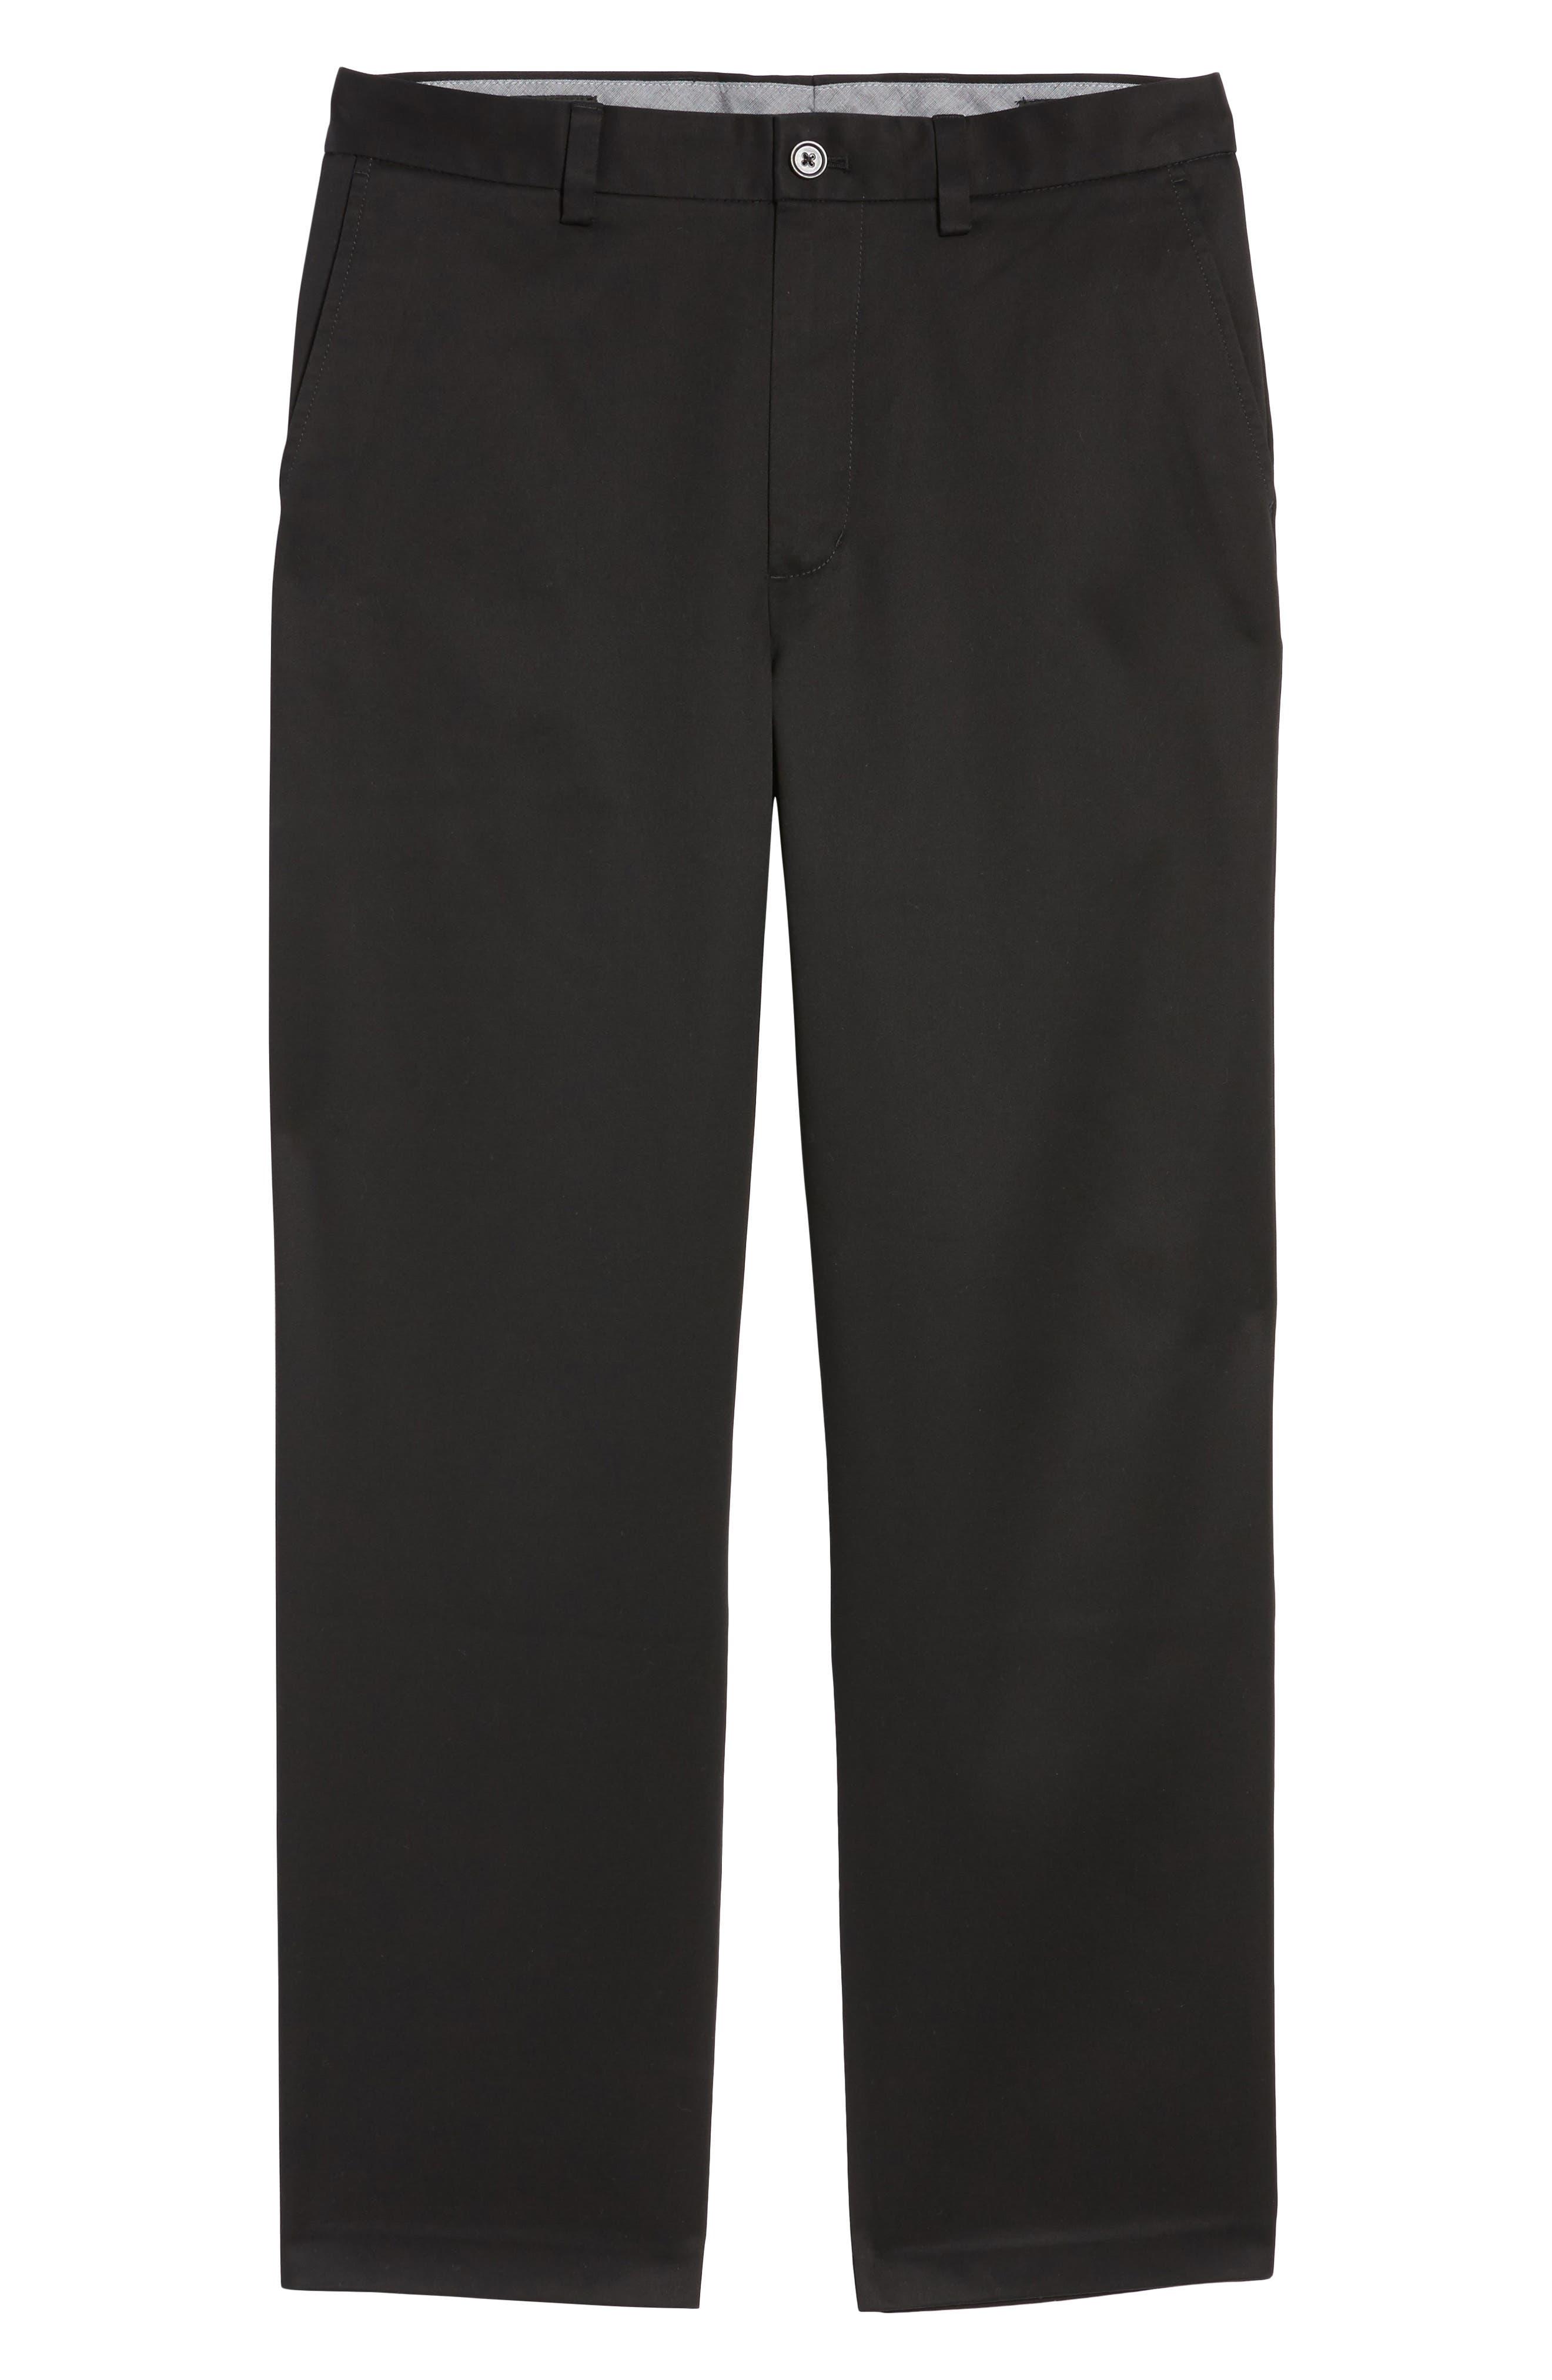 'Classic' Smartcare<sup>™</sup> Relaxed Fit Flat Front Cotton Pants, Main, color, BLACK